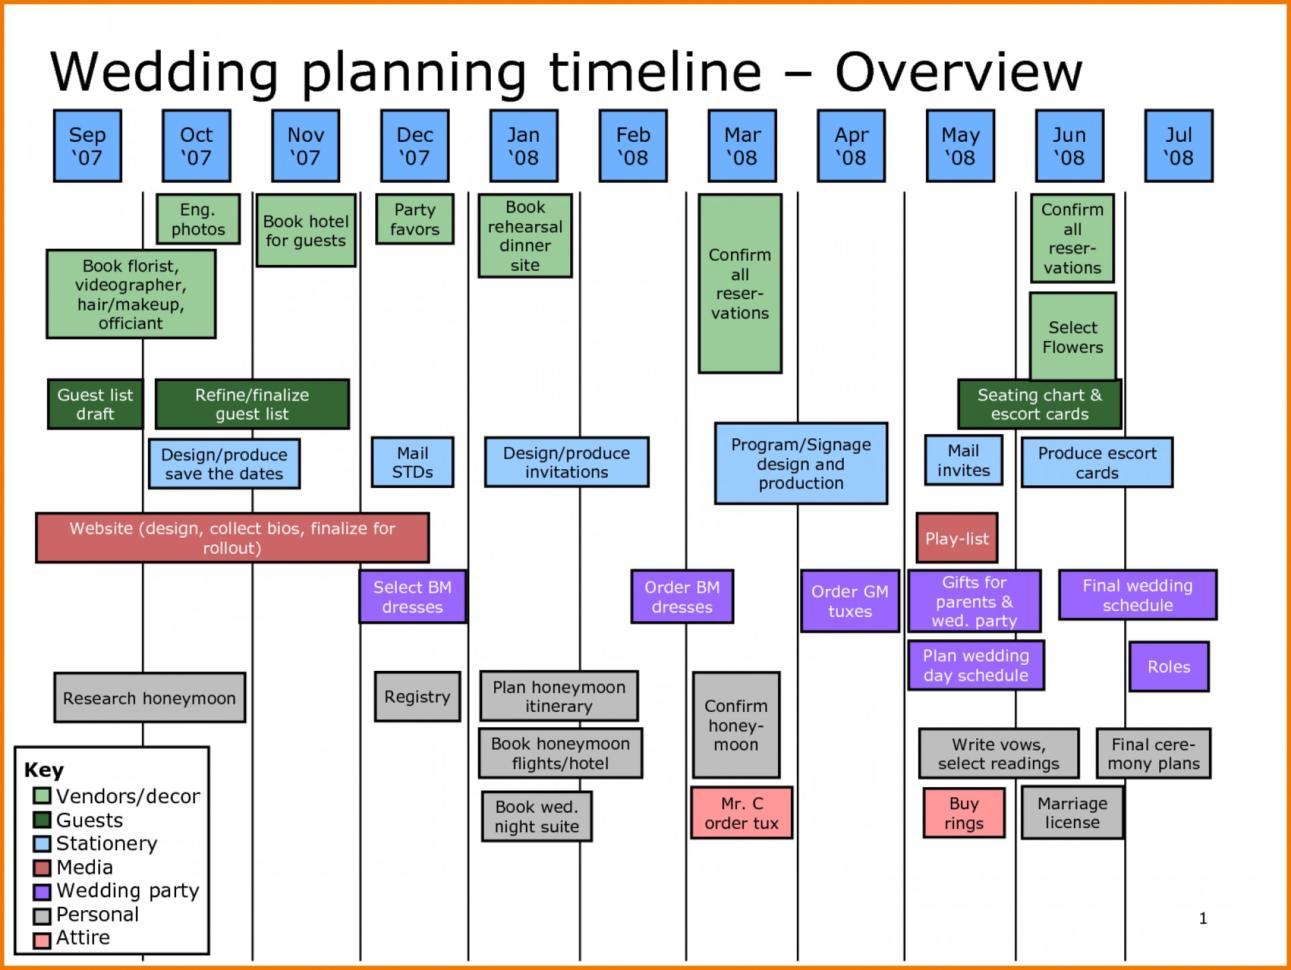 Wedding Planning Spreadsheet Free Pertaining To 008 Wedding Planning Timeline Template ~ Ulyssesroom